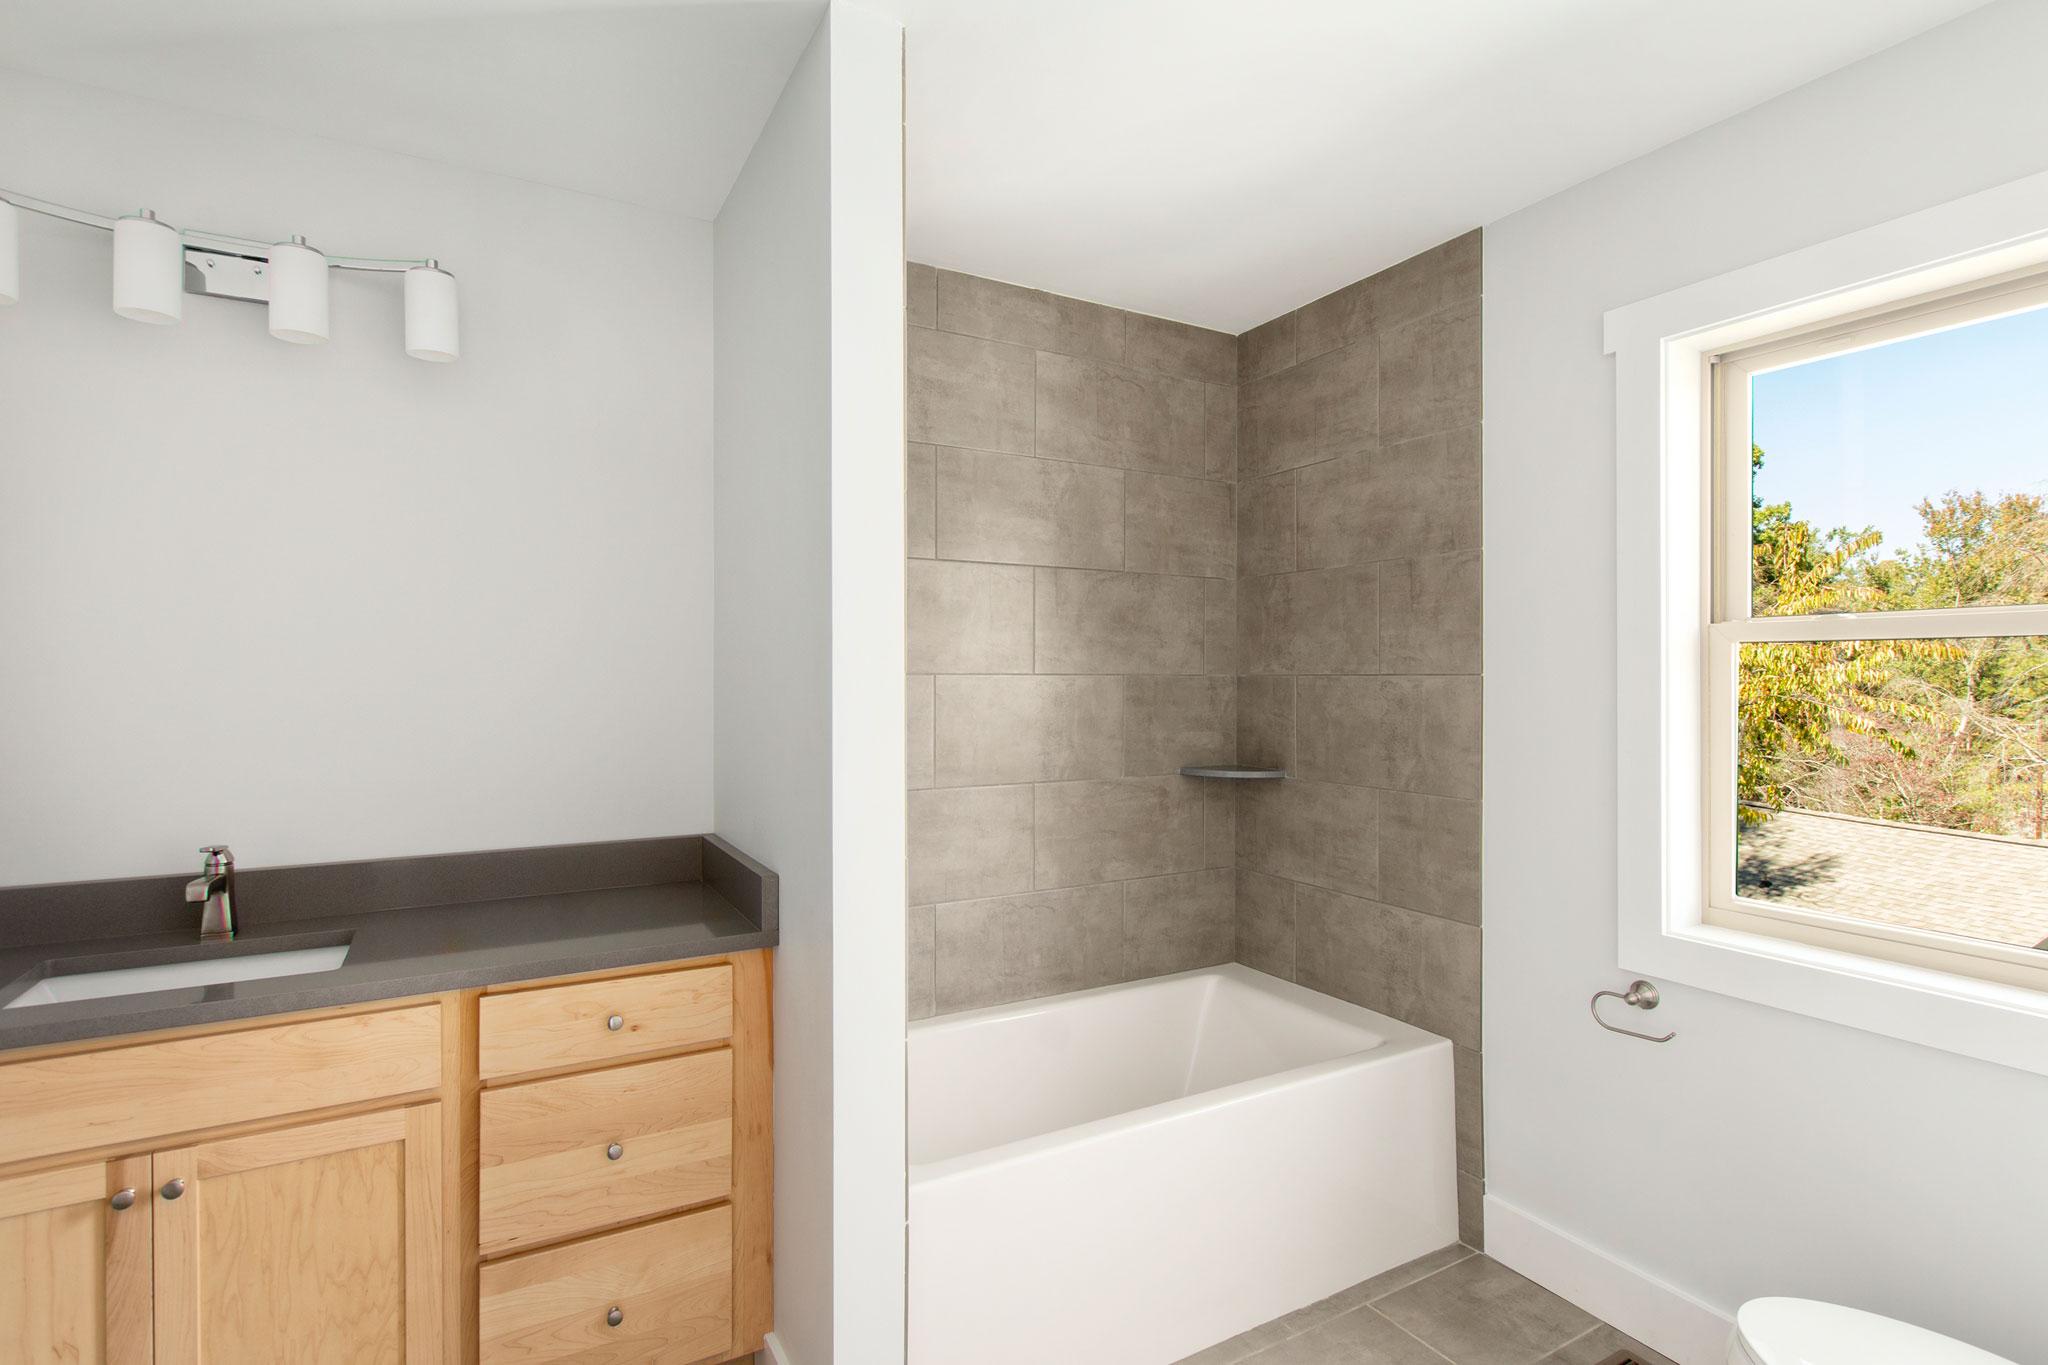 16 Upstairs Bath.jpg